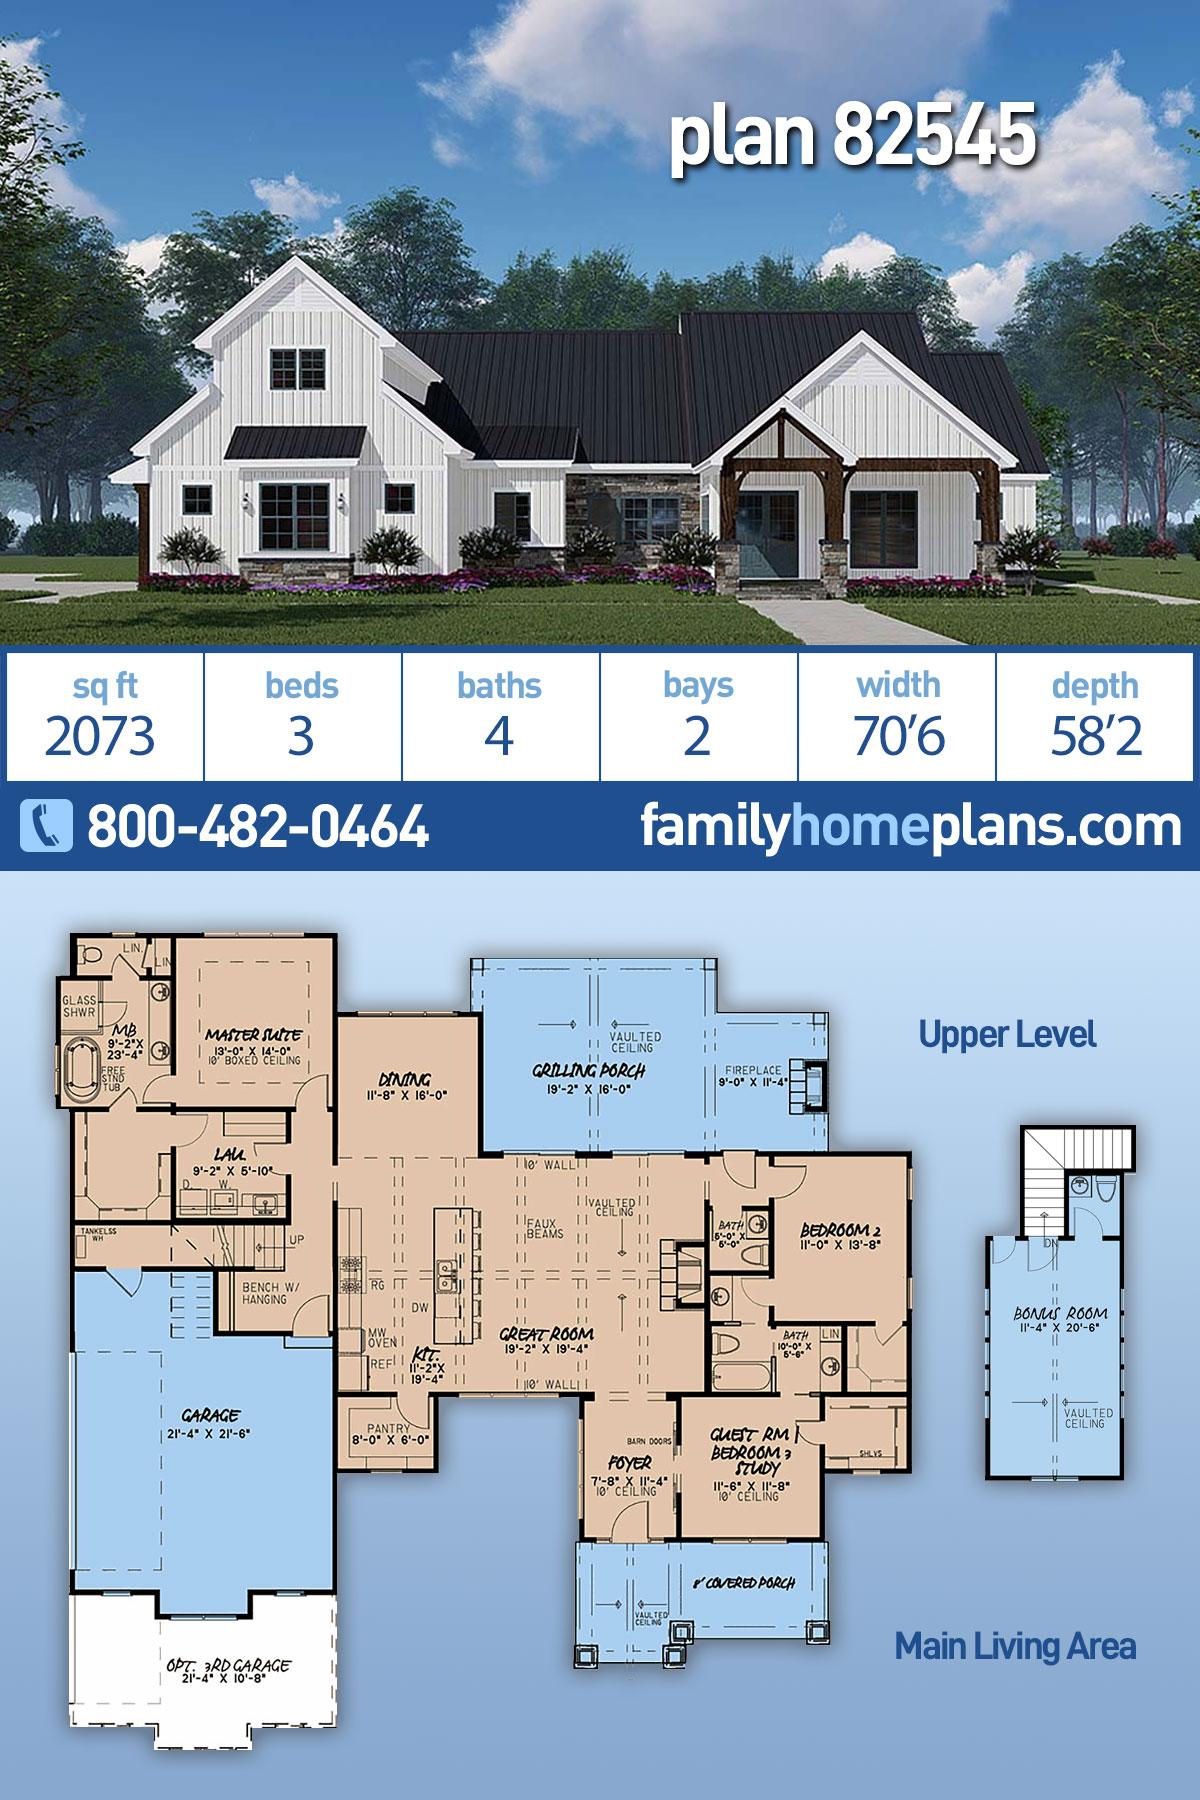 Bungalow, Craftsman, Farmhouse, Modern House Plan 82545 with 3 Beds, 4 Baths, 2 Car Garage